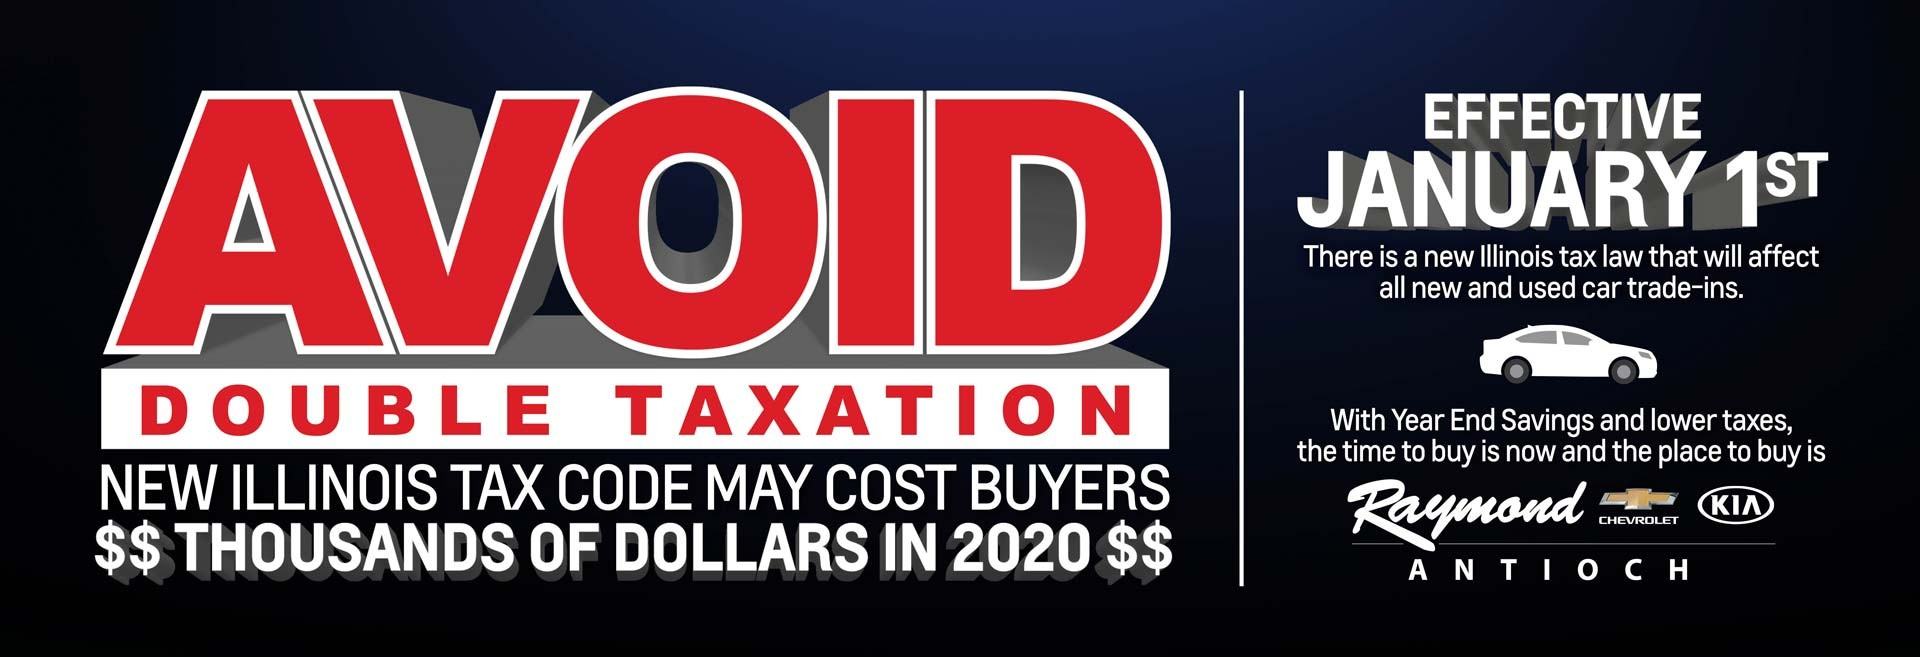 Avoid Double Taxation